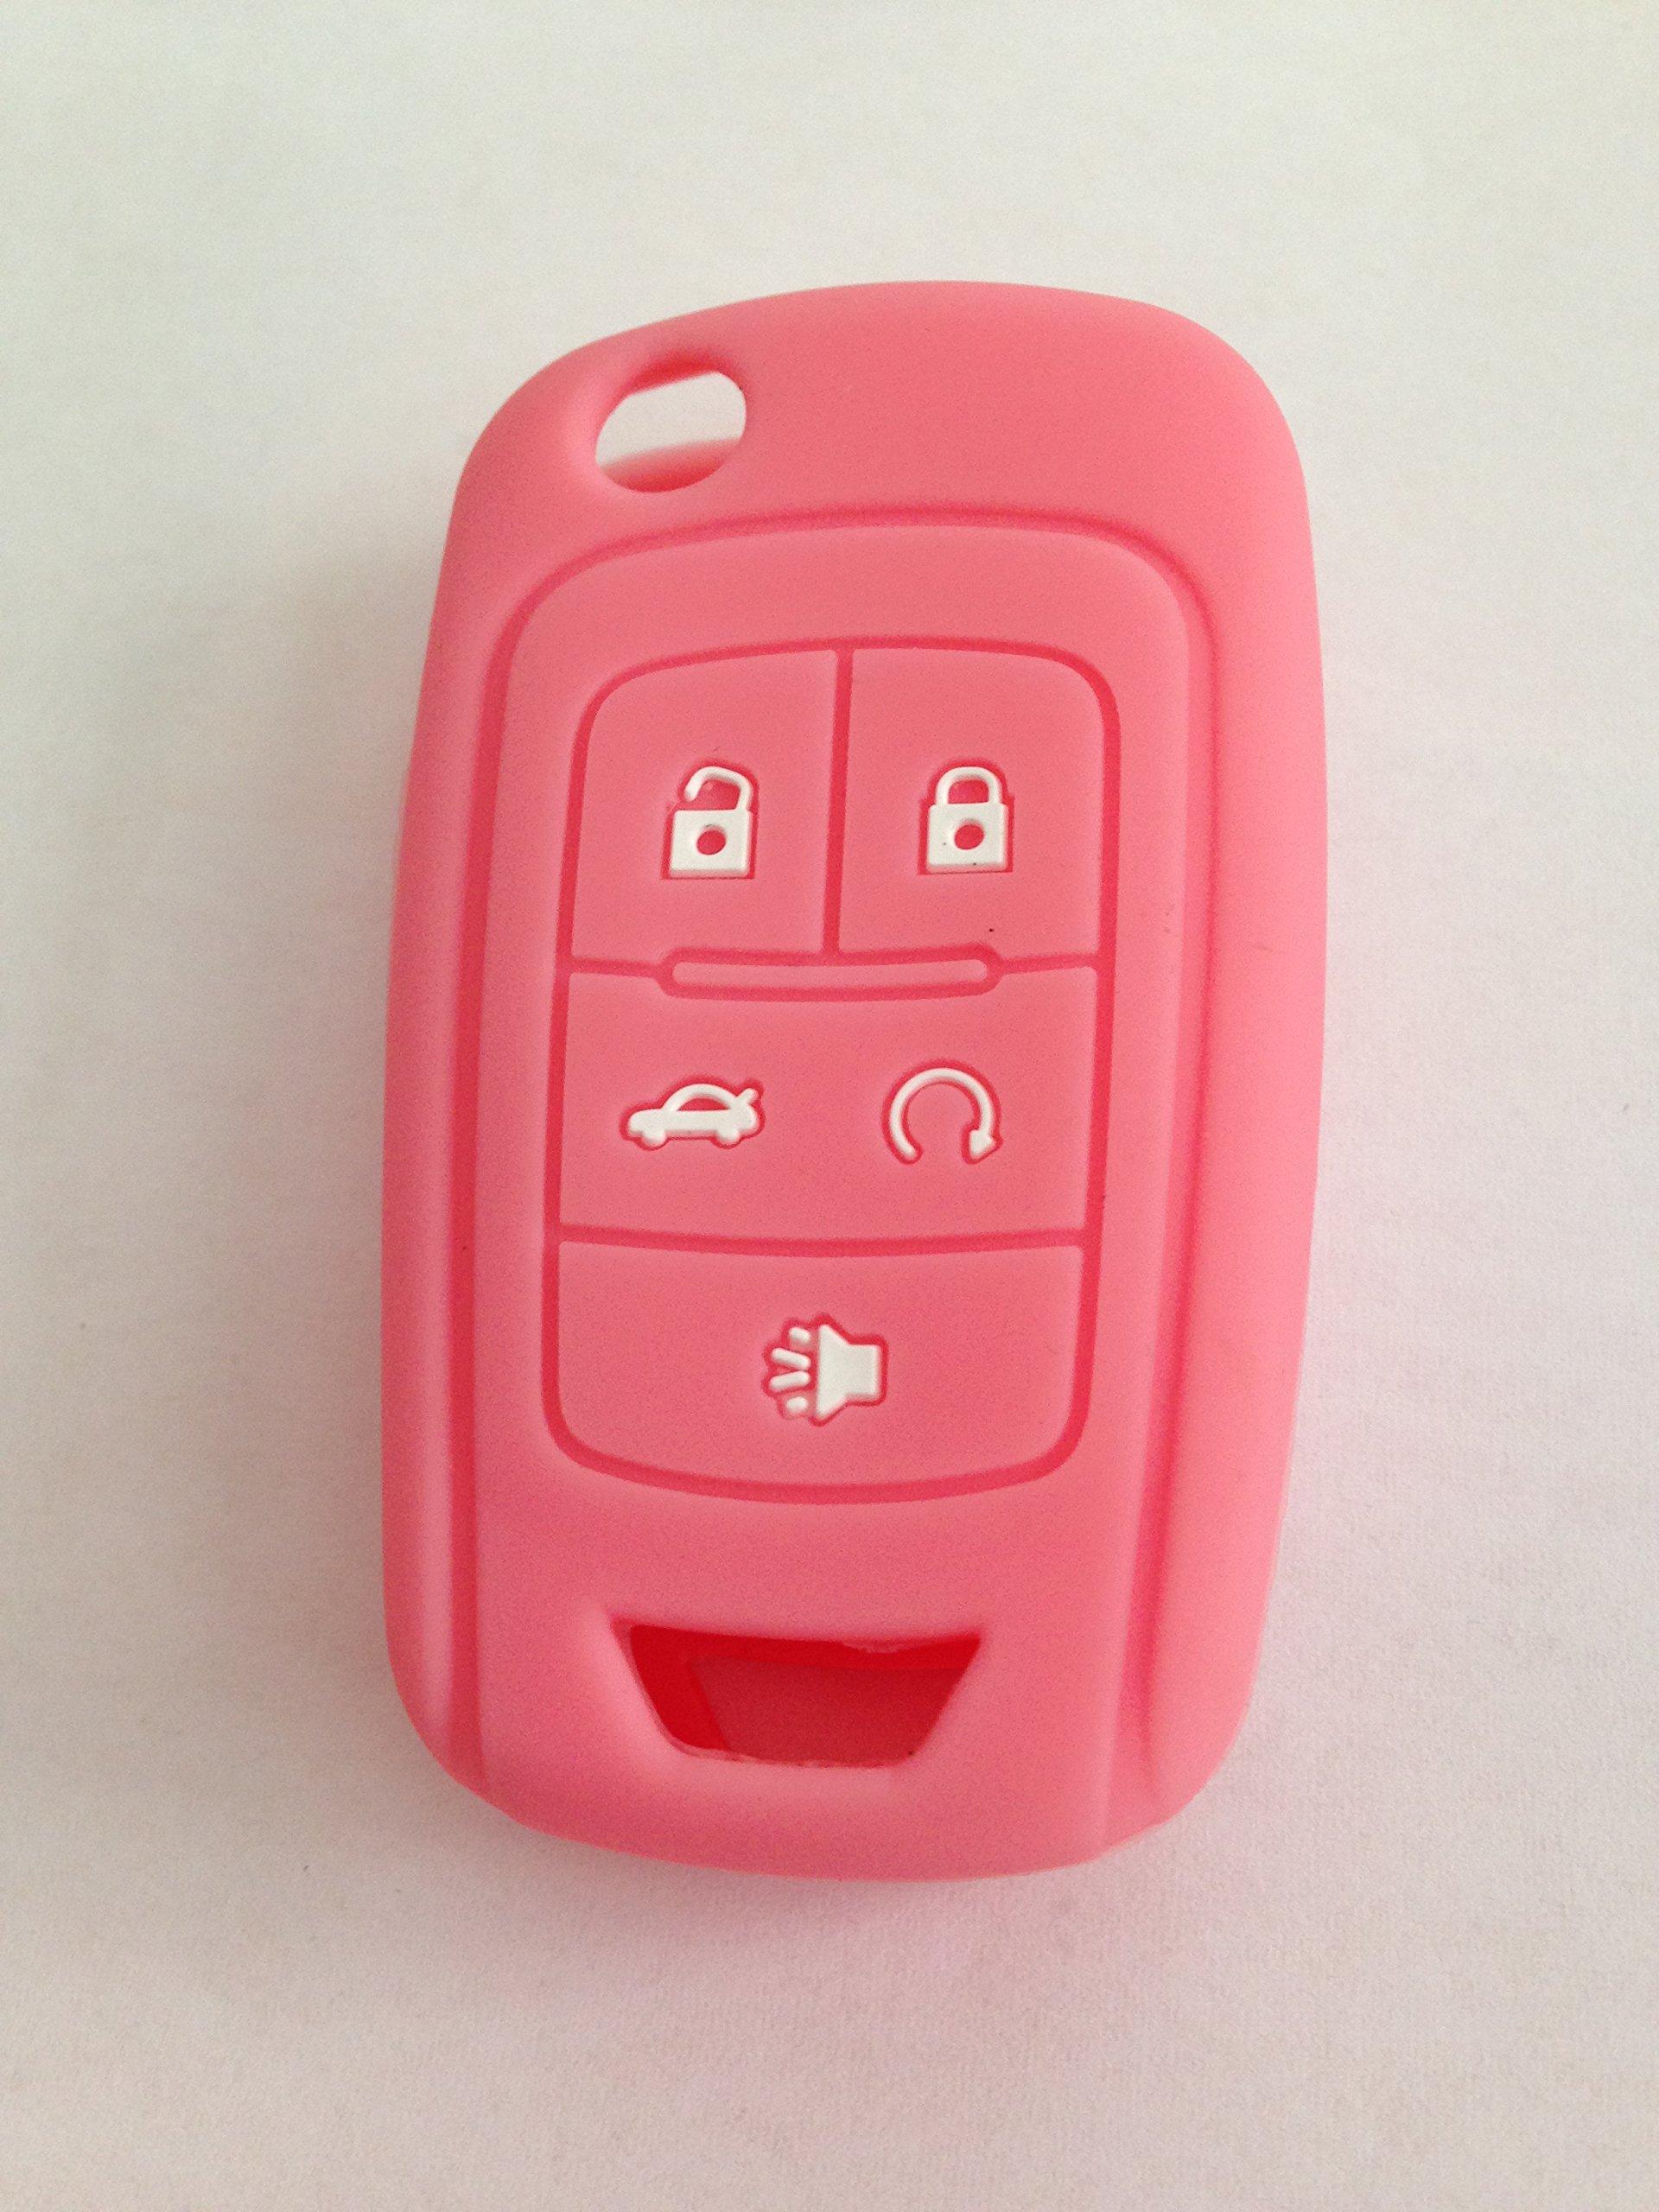 TCKEY Pink Silicone Cover Holder Key Jacket for Chevrolet Camaro Cruze Volt Equinox Spark Malibu Sonic Flip Remote Key Case Shell 5 BTN BK